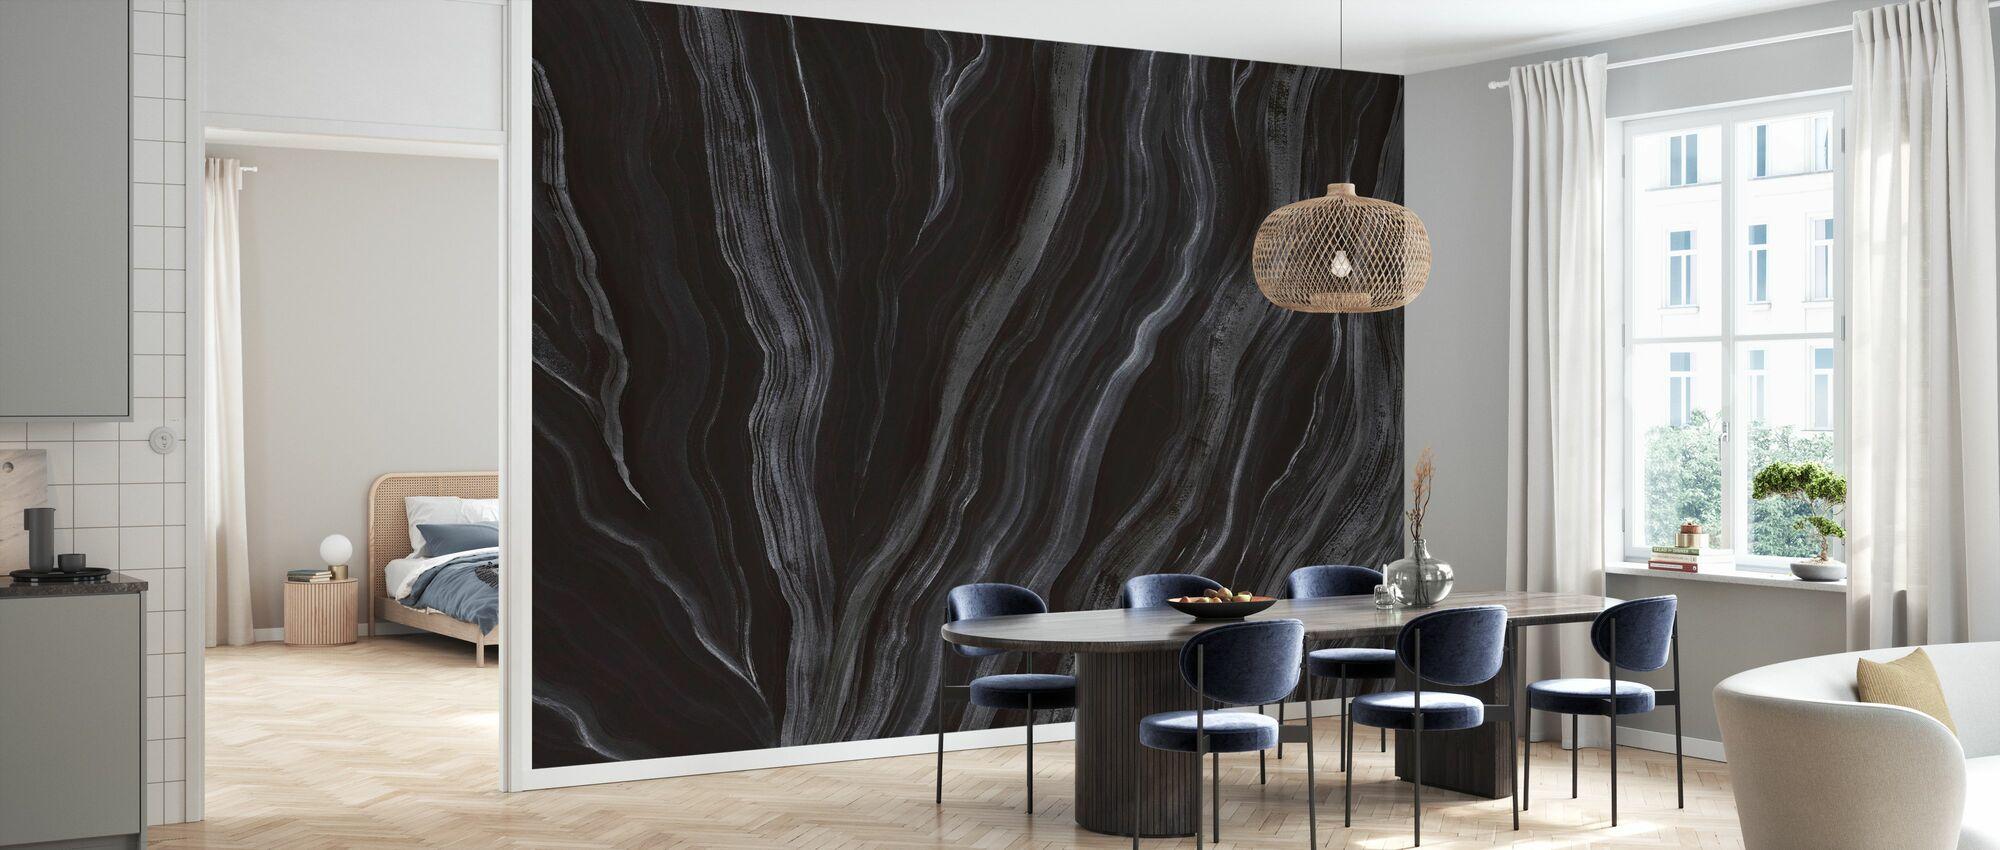 Unearth - Onyx - Behang - Keuken